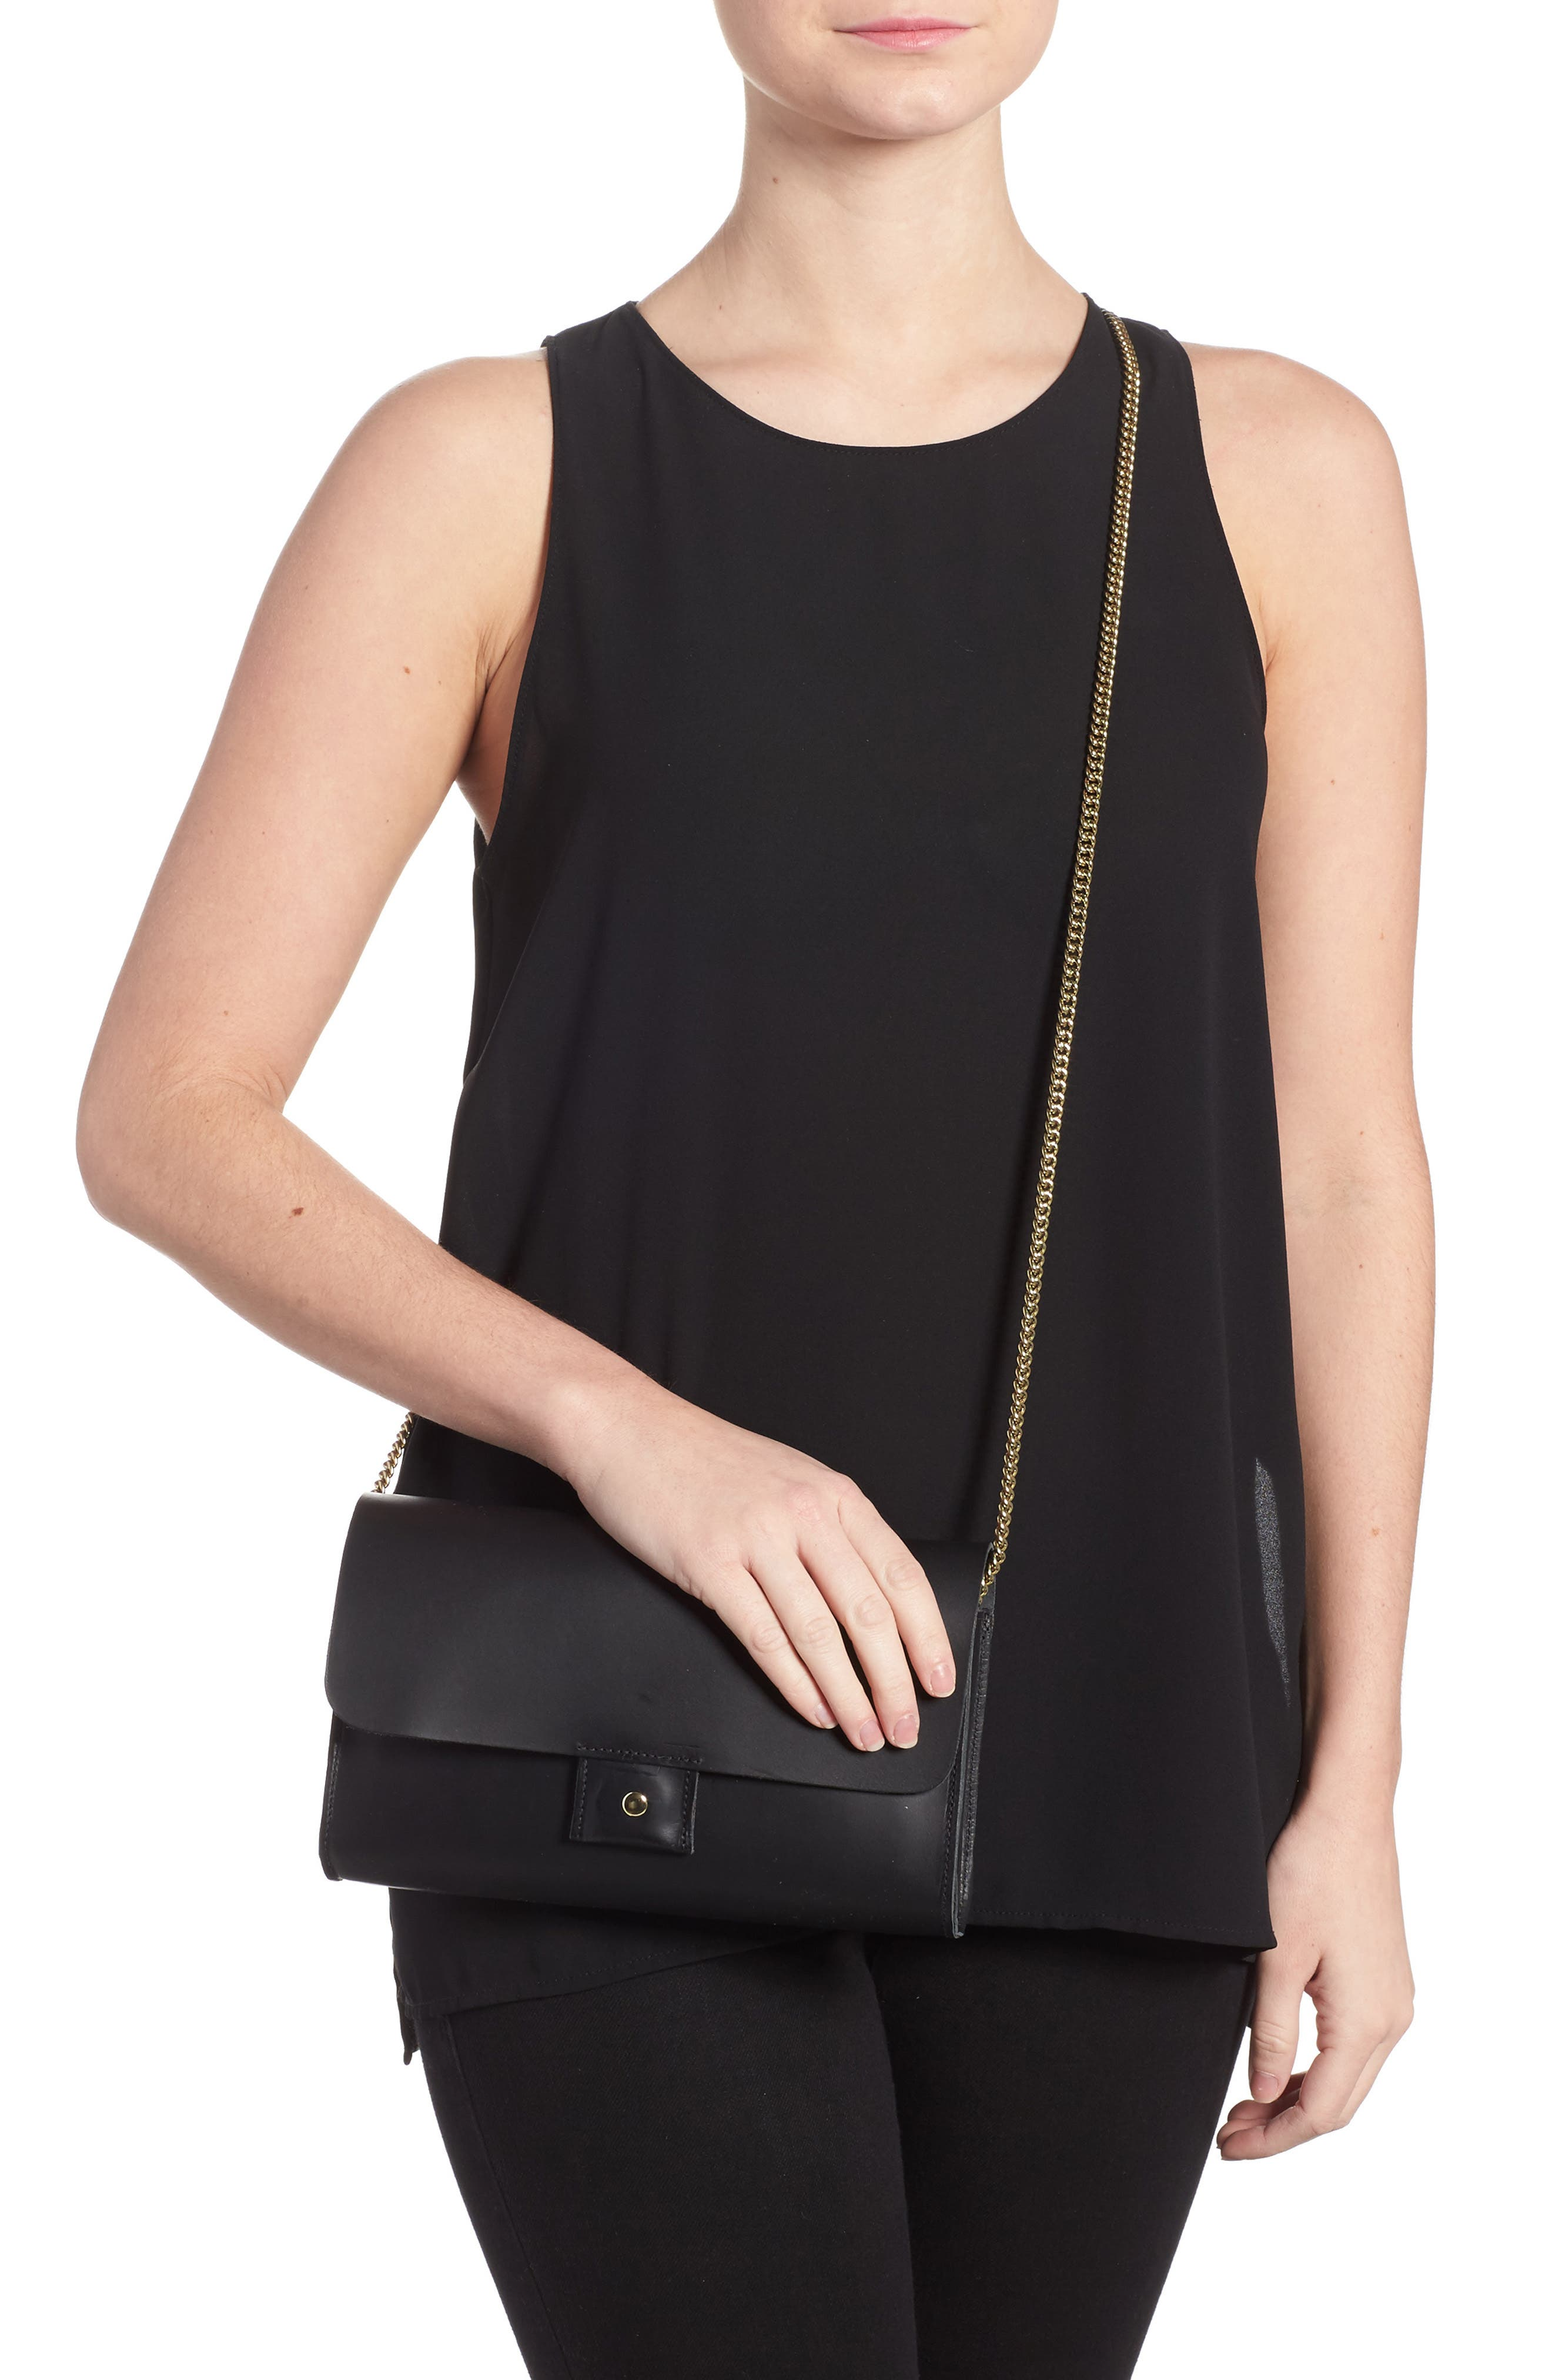 Colette Maison Leather Shoulder Bag,                             Alternate thumbnail 2, color,                             Black Veg